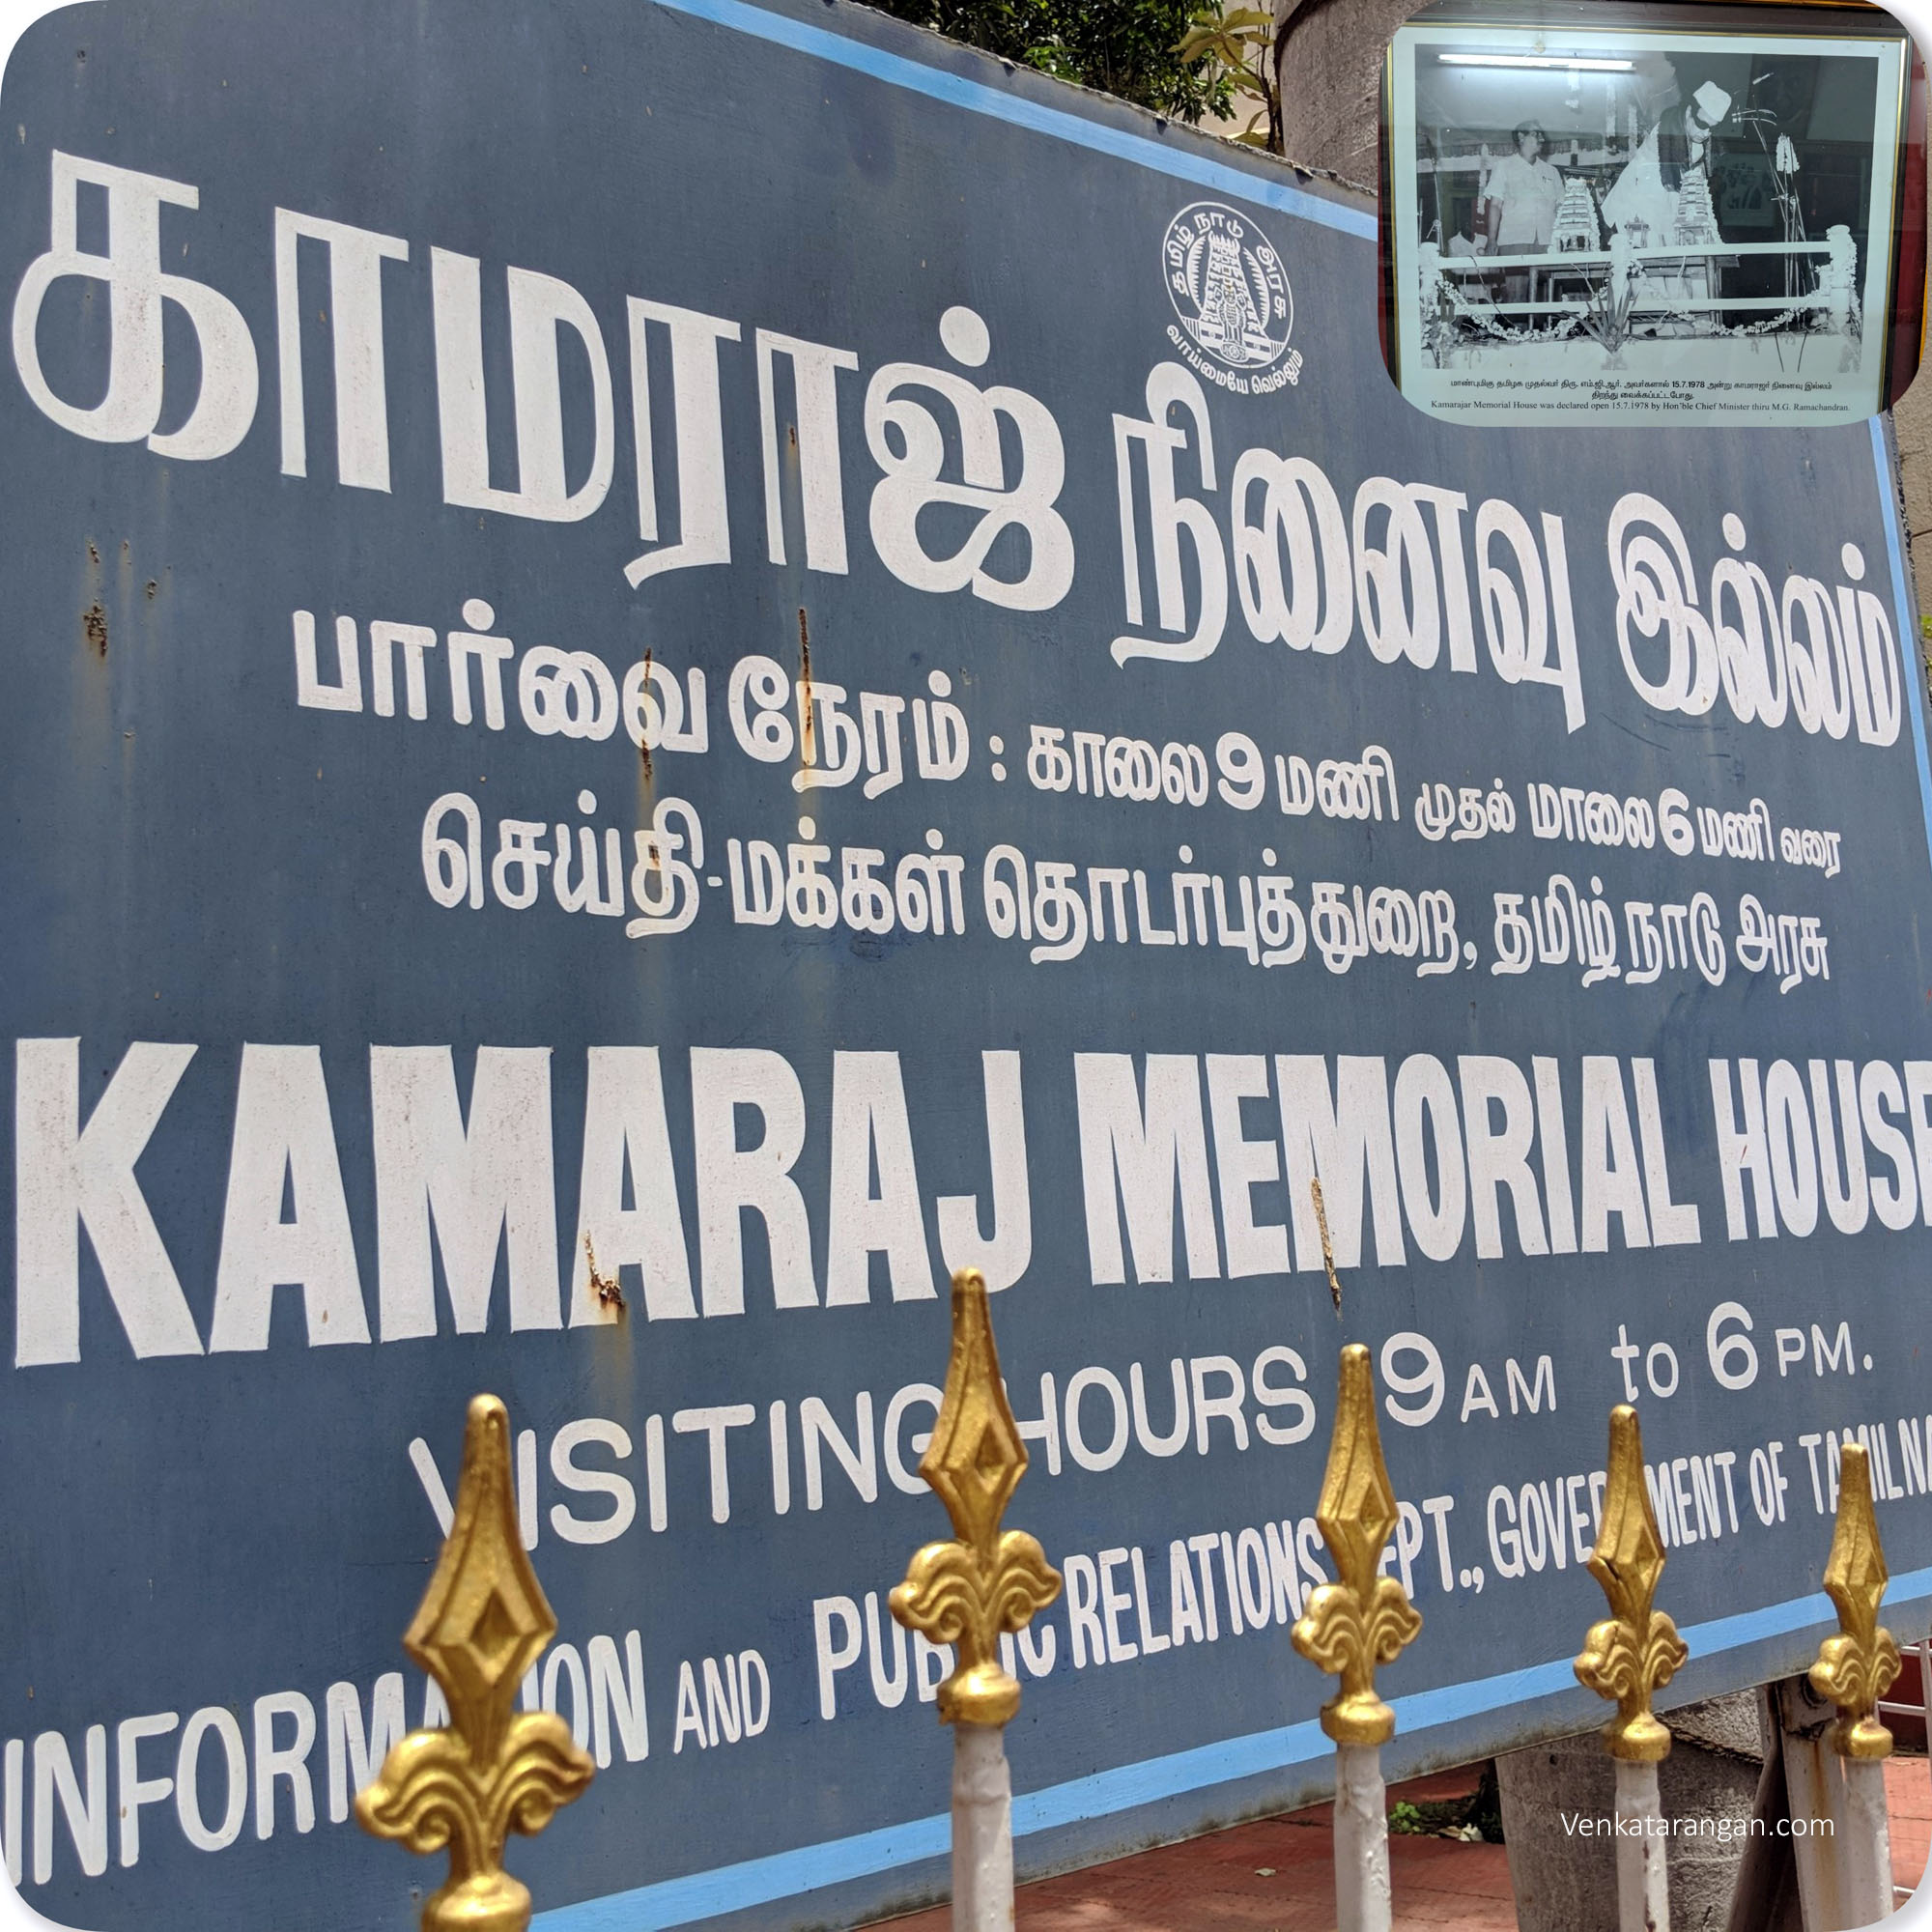 Kamarajar Memorial House was declared open on 1978 by then Chief Minister Thiru M.G.Ramachandran - காமராஜர் நினைவு இல்லம், 1978இல் அப்போதைய முதல்வர் திரு எம்.ஜி.ஆர். அவர்களால் திறக்கப்பட்டது.